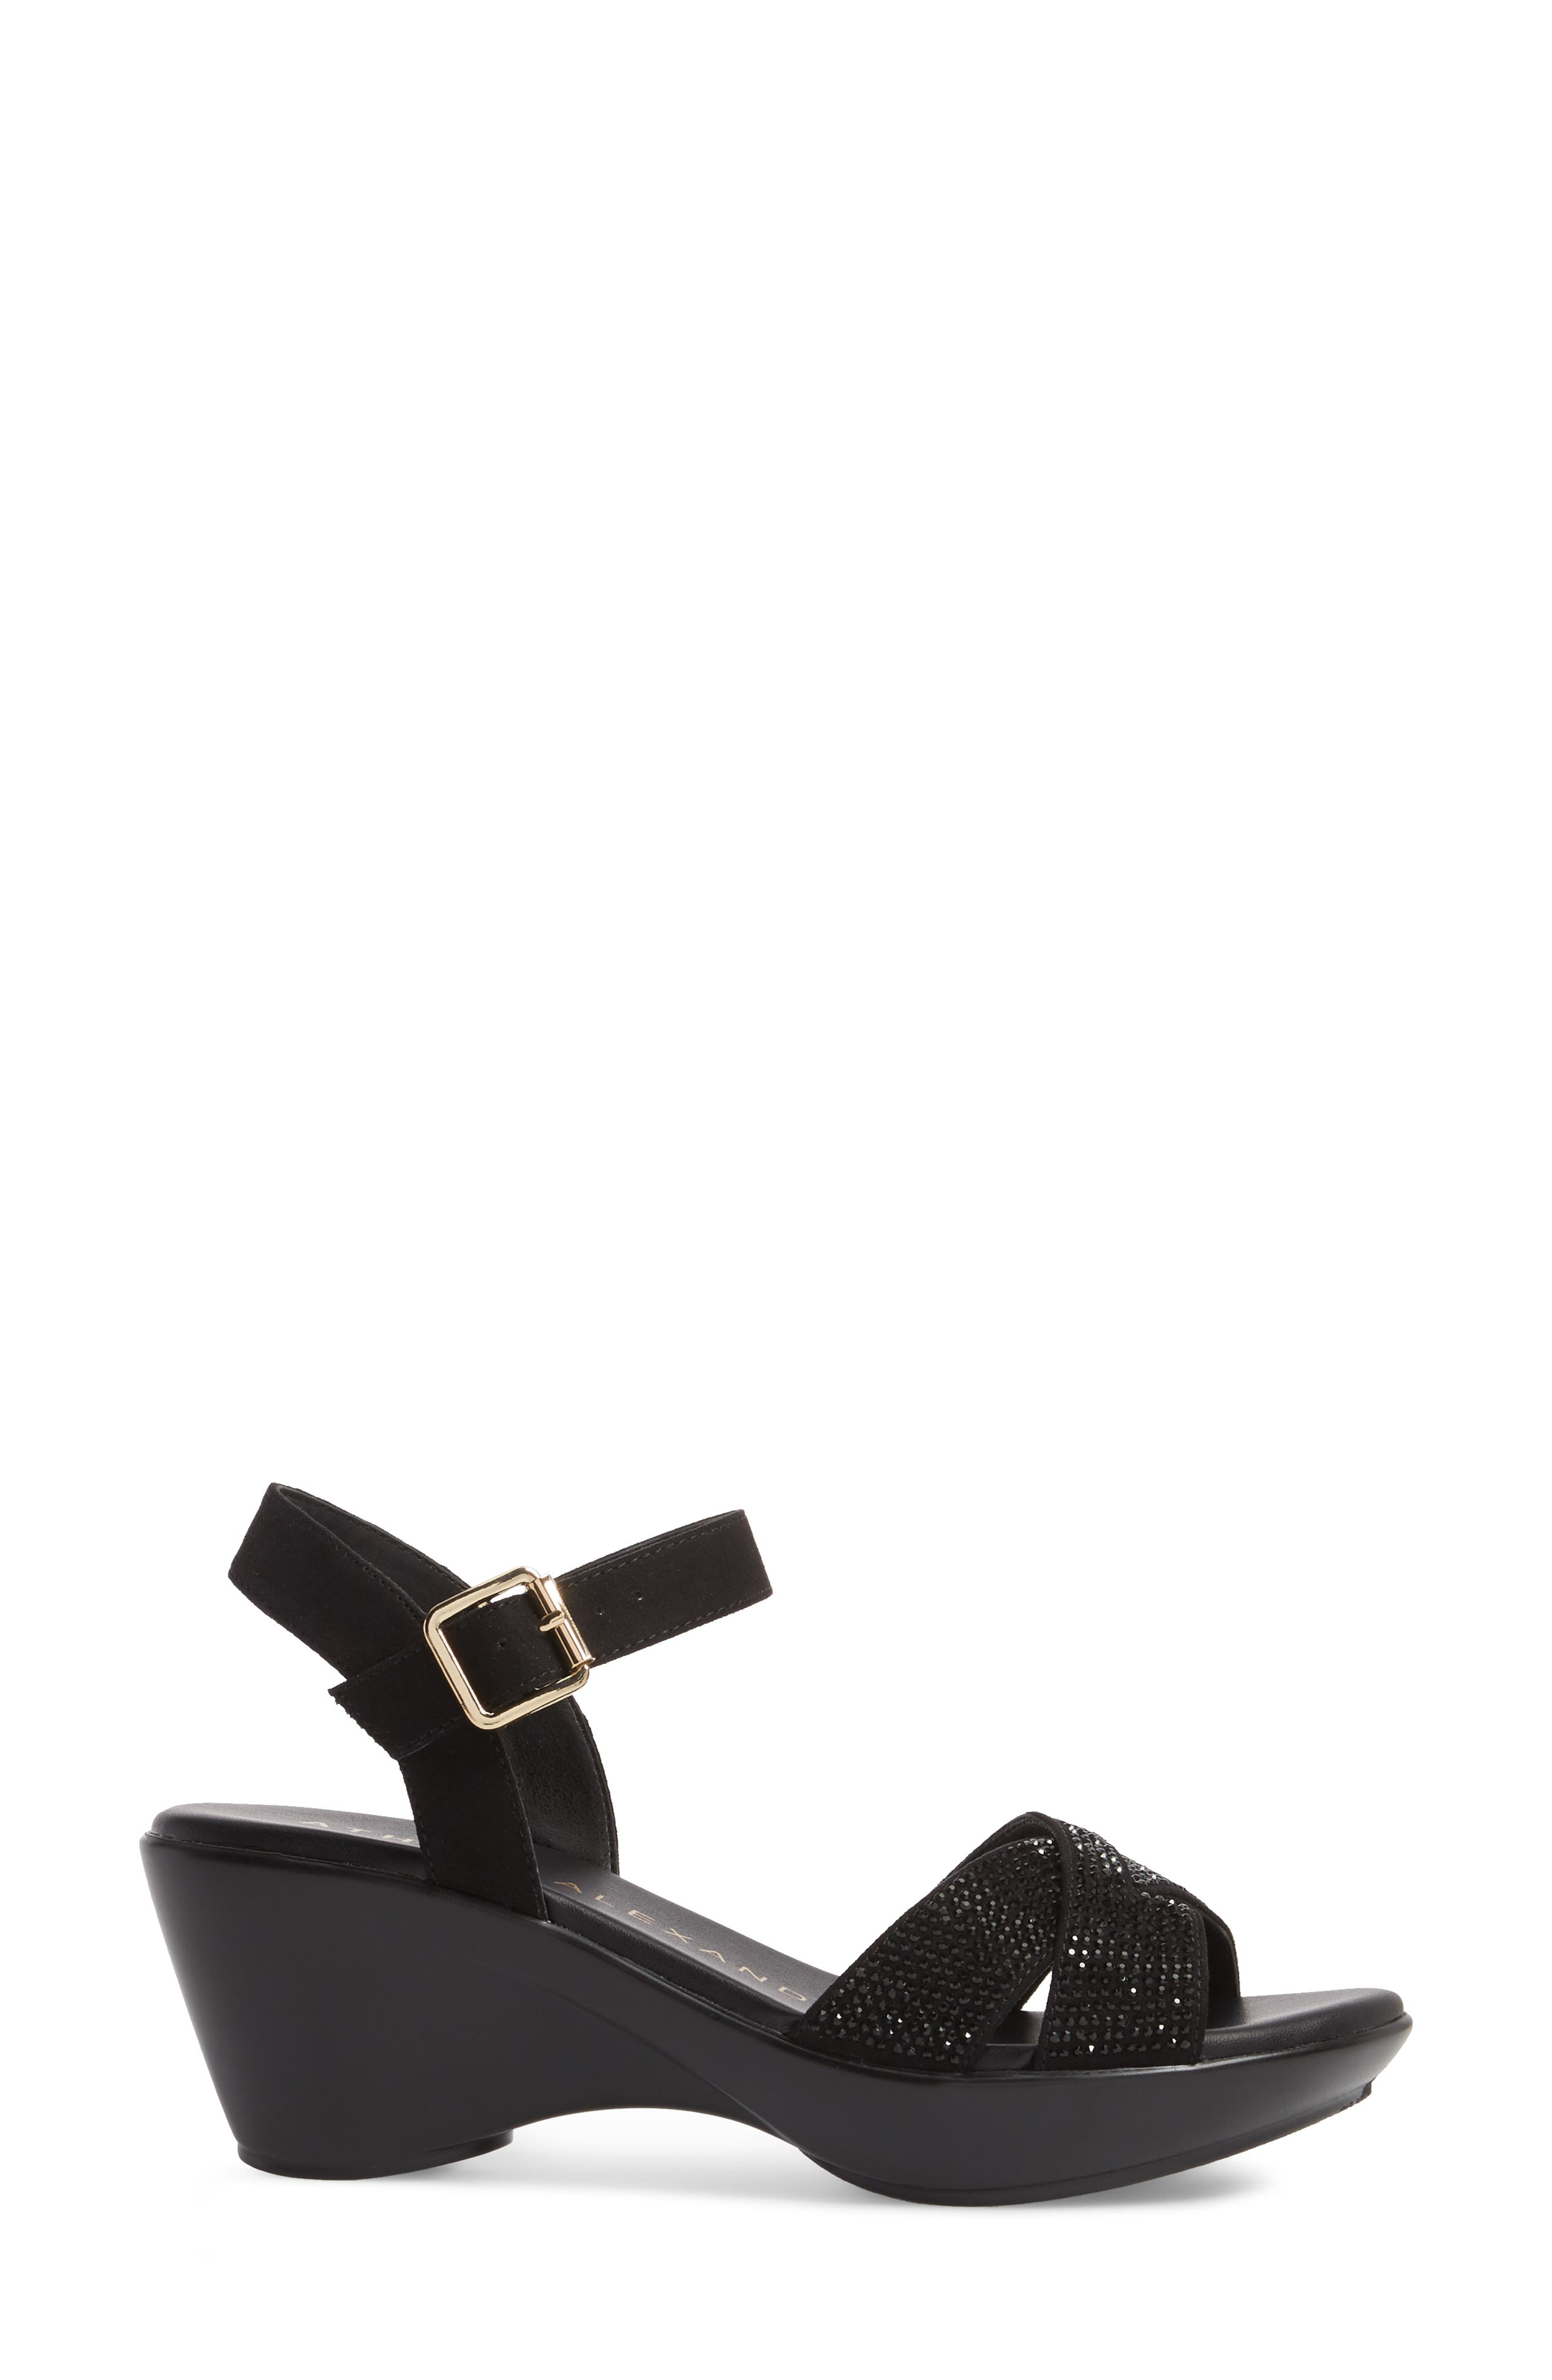 Florence Wedge Sandal,                             Alternate thumbnail 3, color,                             BLACK FAUX SUEDE